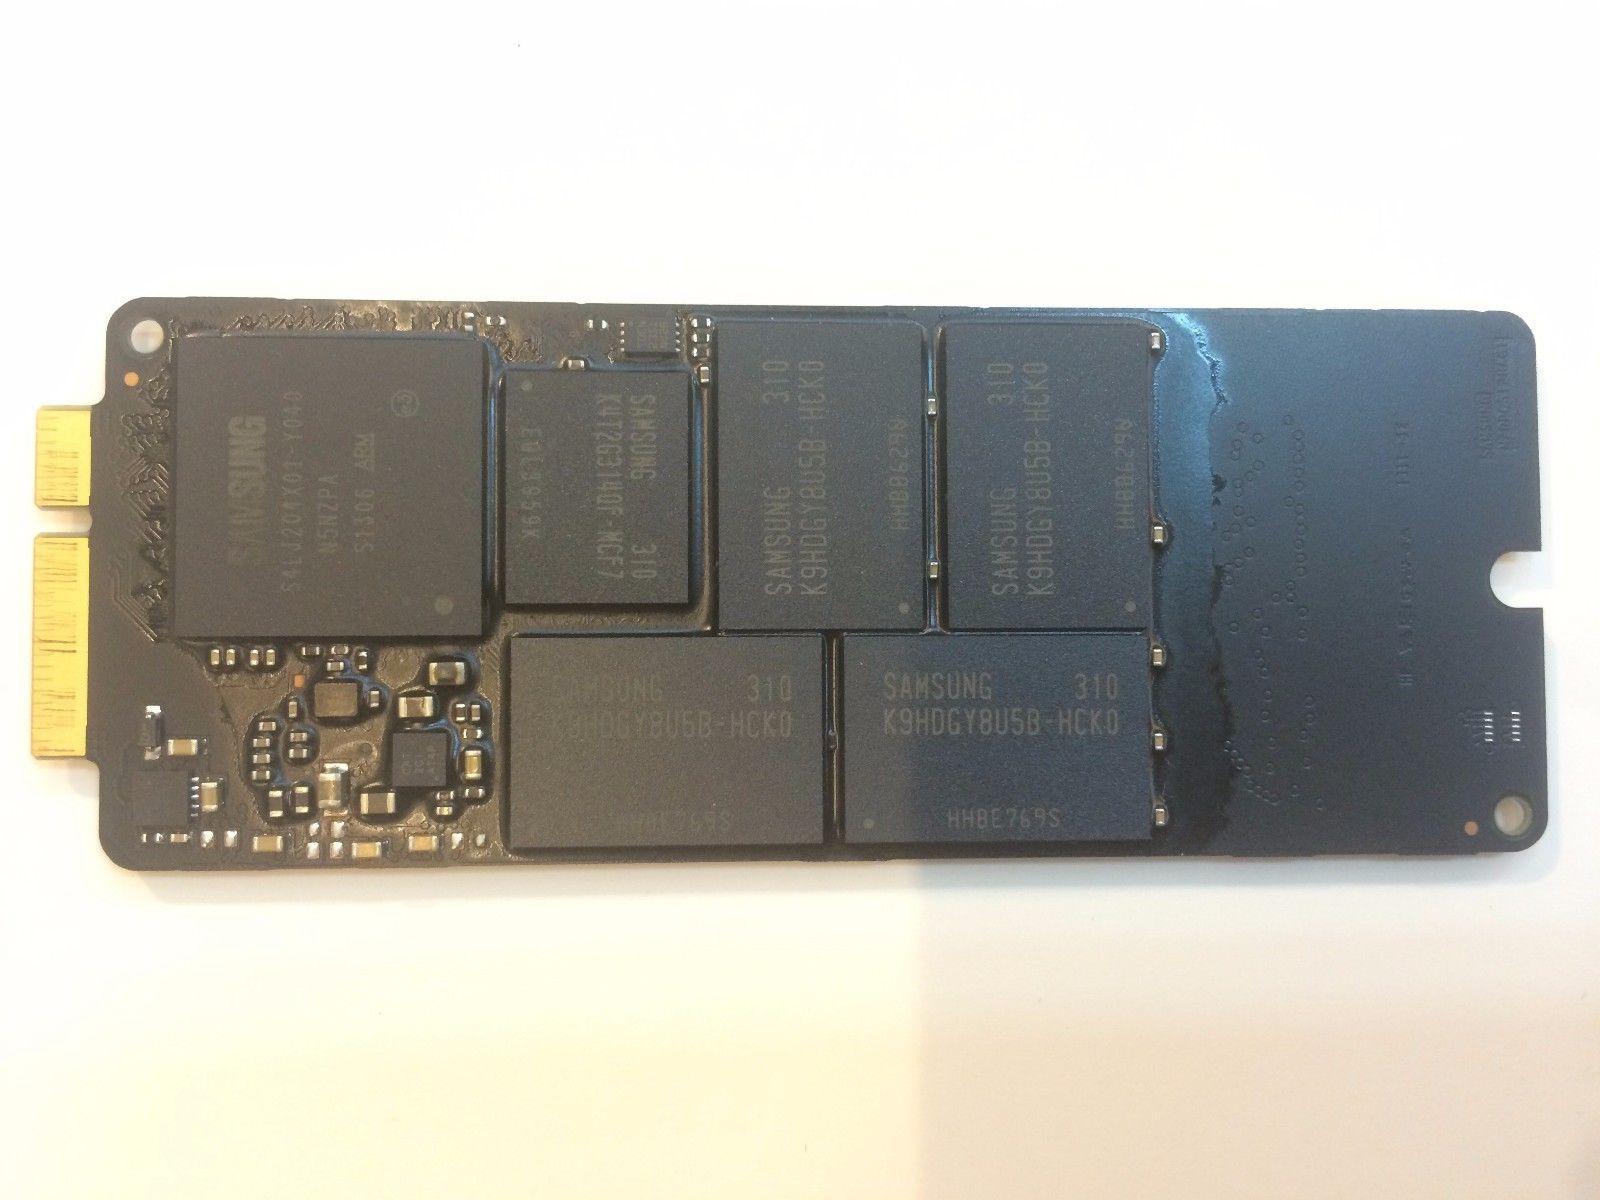 macbook A1425 ssd harddsik